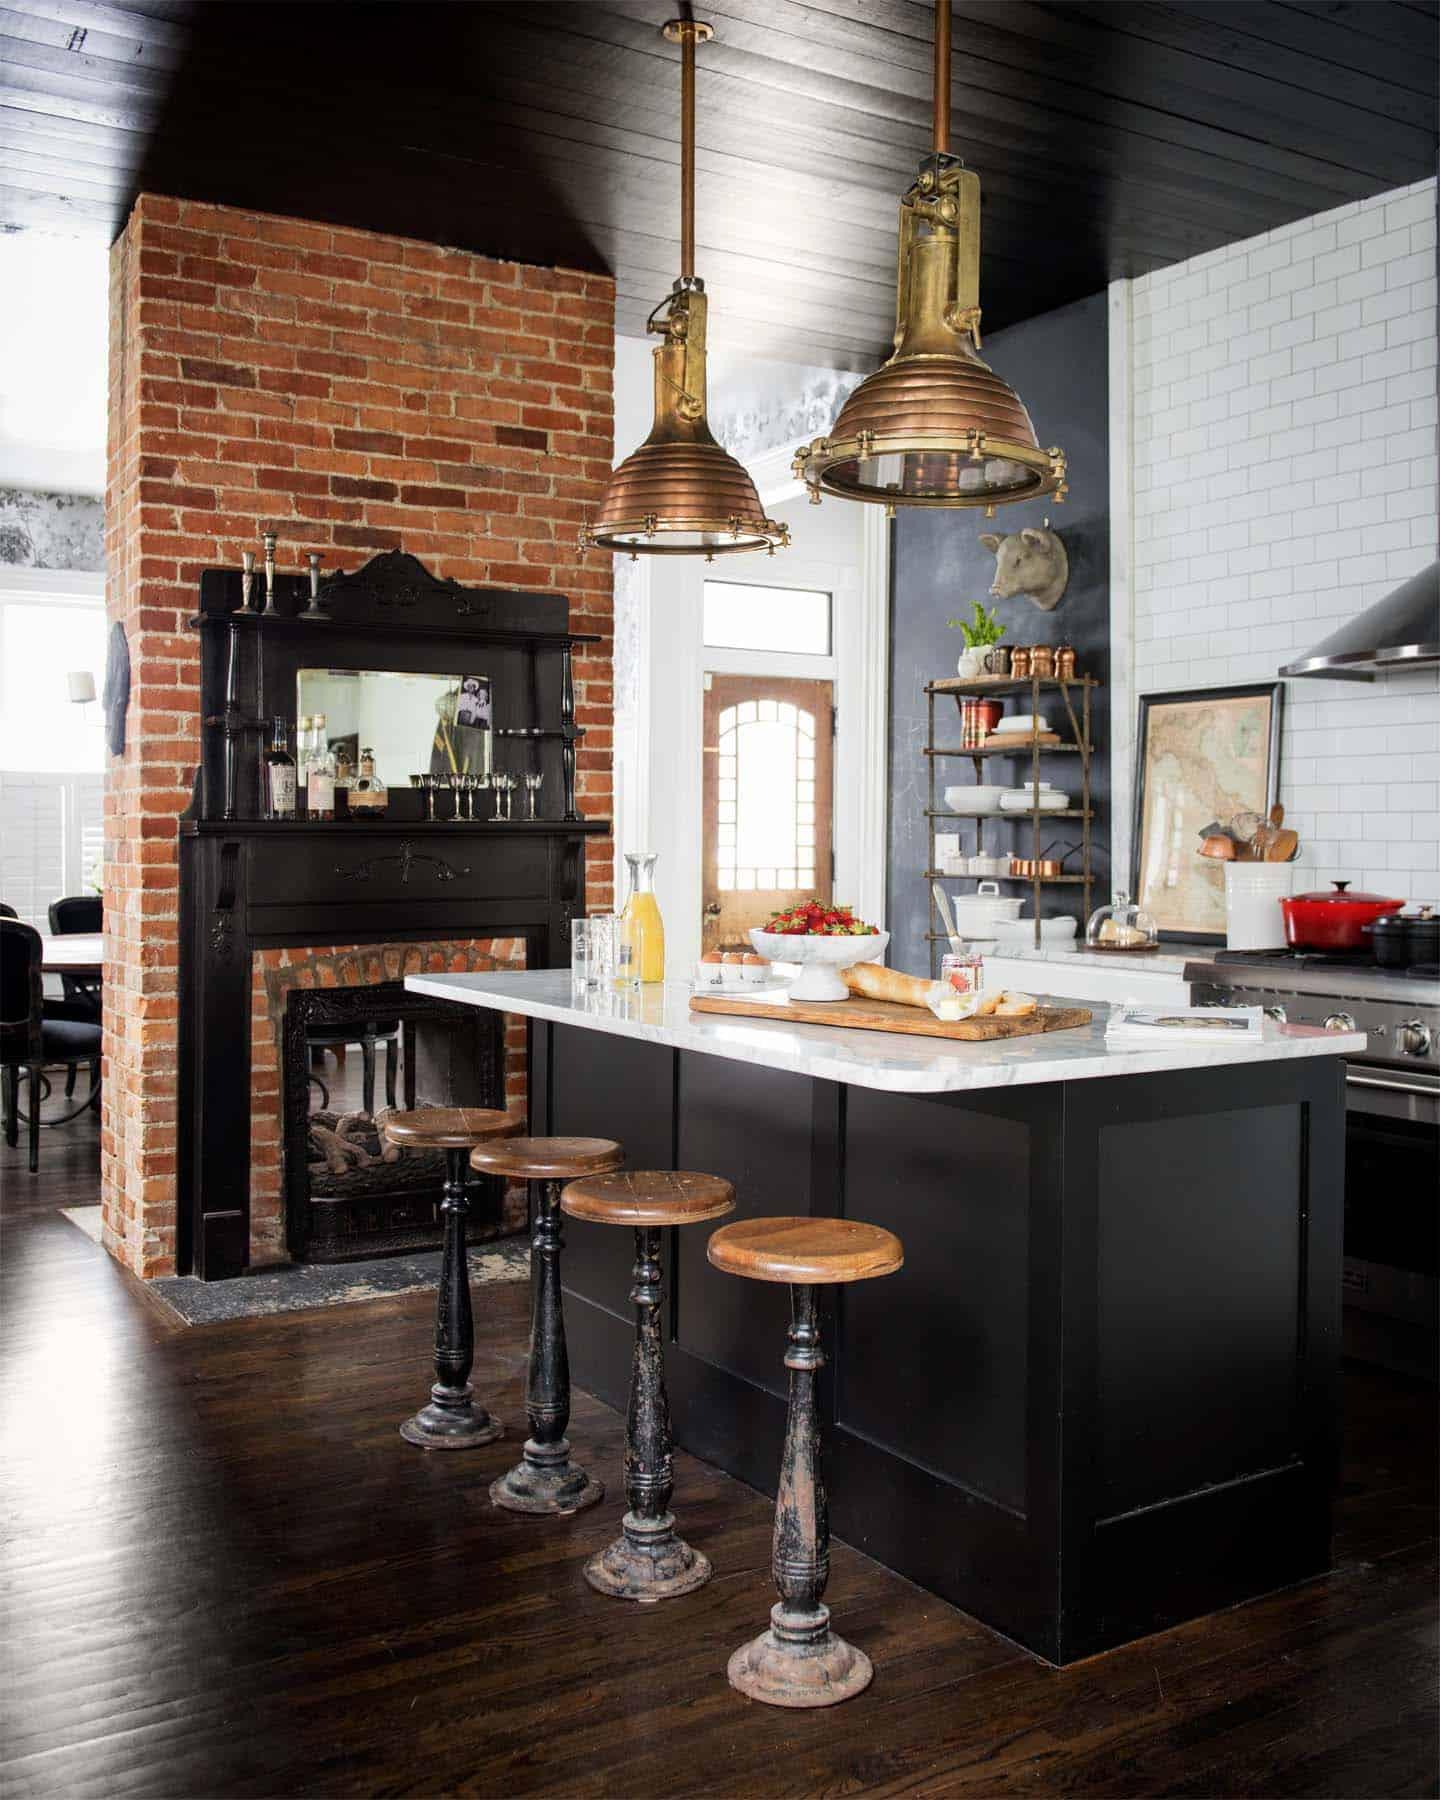 Kitchen Showcasing Cozy Fireplace-15-1 Kindesign